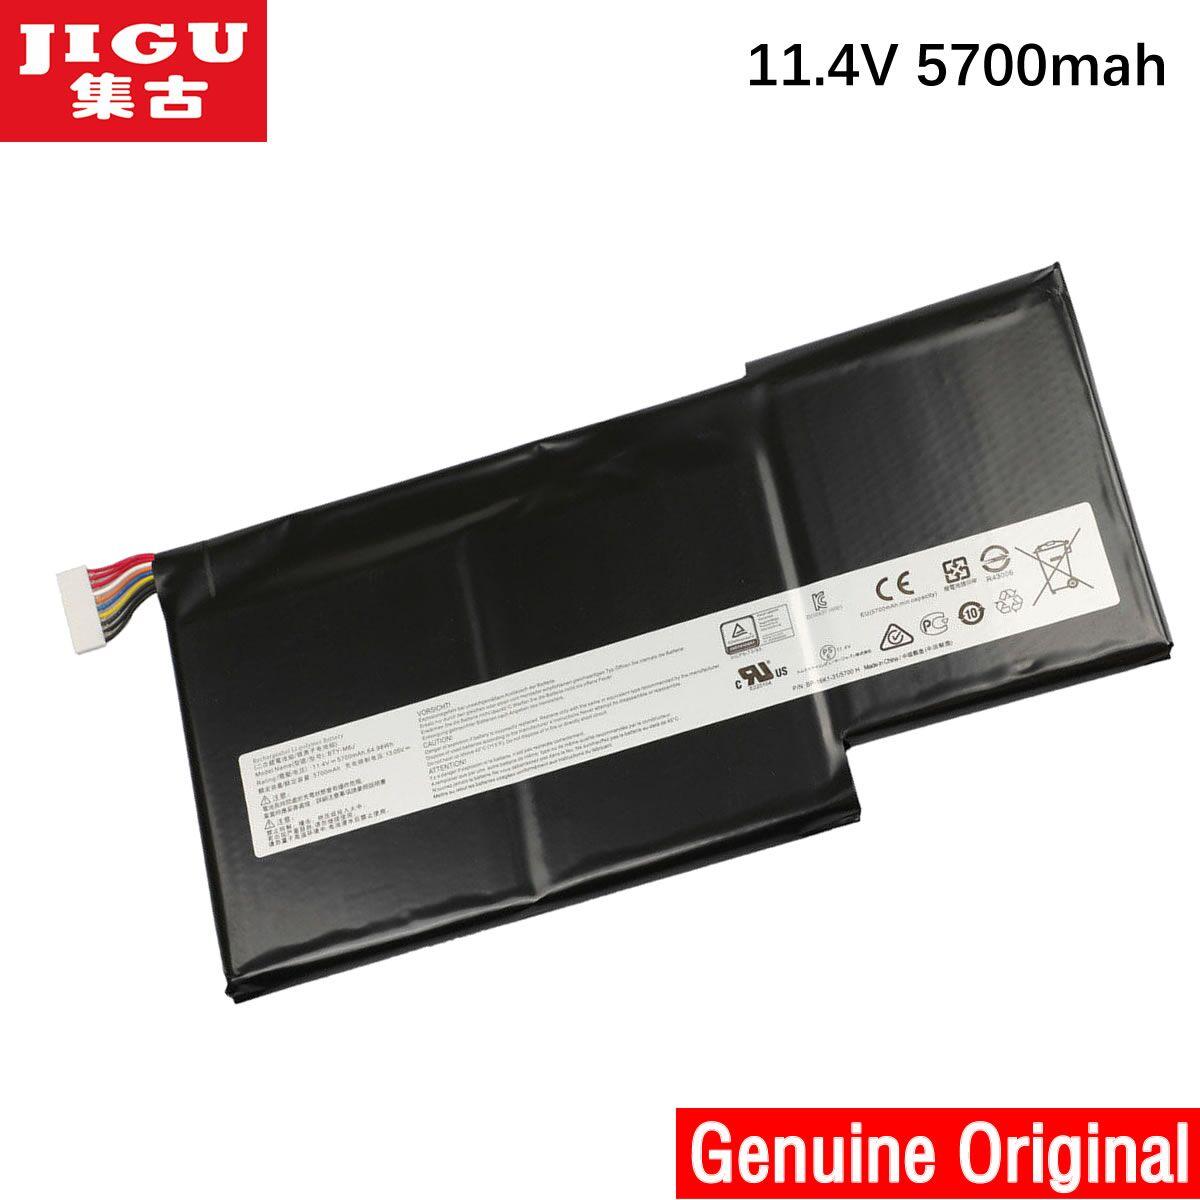 JIGU New 11.4V 64.98Wh 5700mAh BTY-M6J Battery For MSI Stealth GS63VR GS73VR 6RF016CN BTY-U6J Series